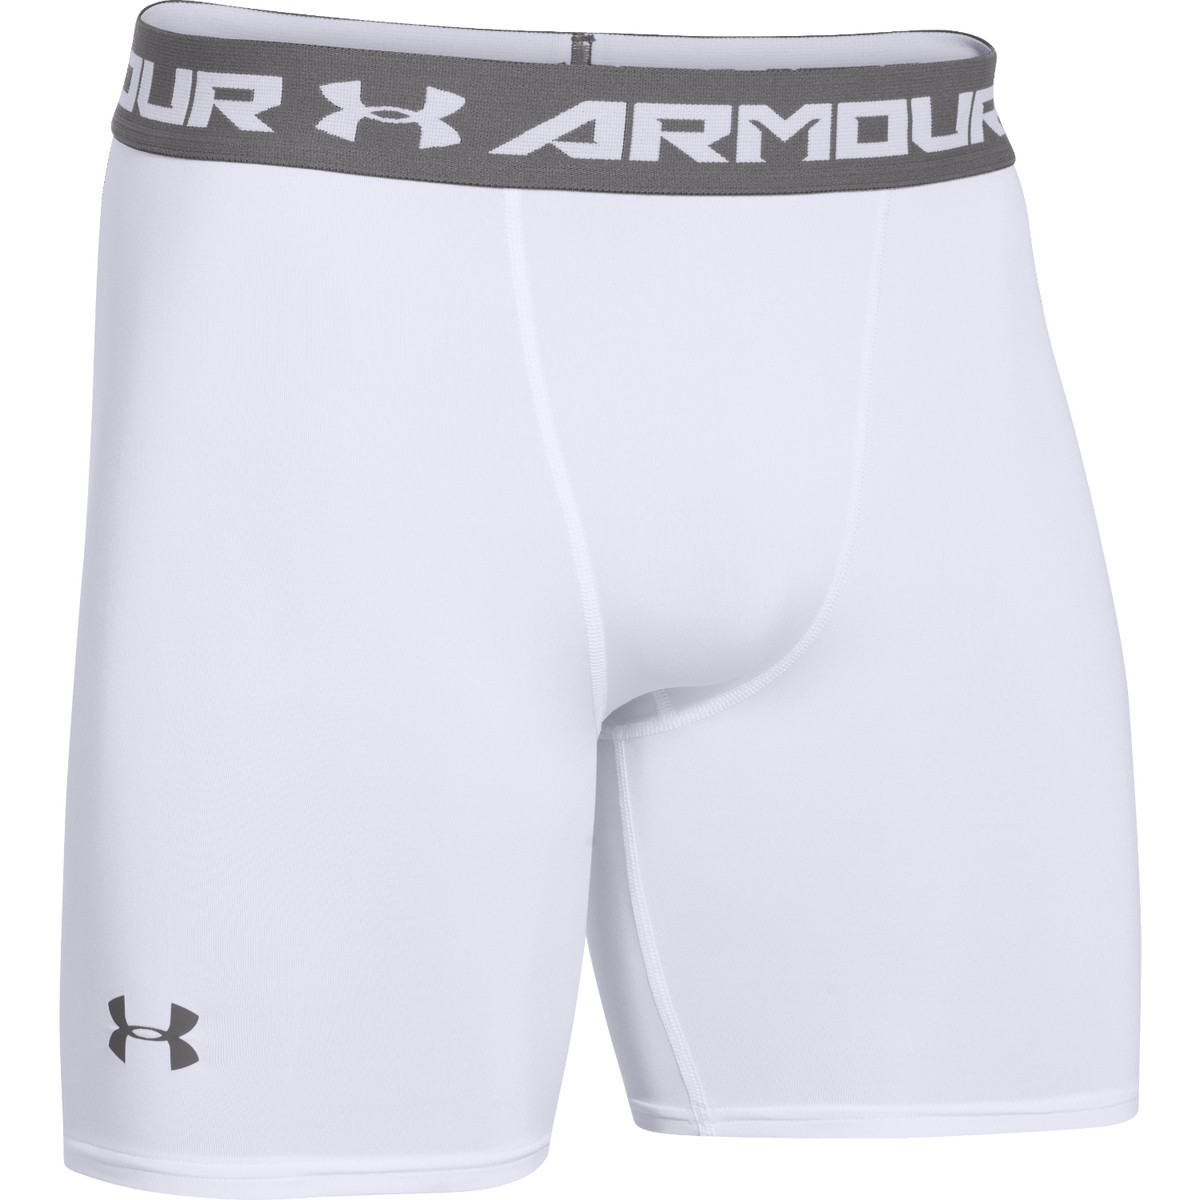 Трусы Under Armour Compression Shorts L